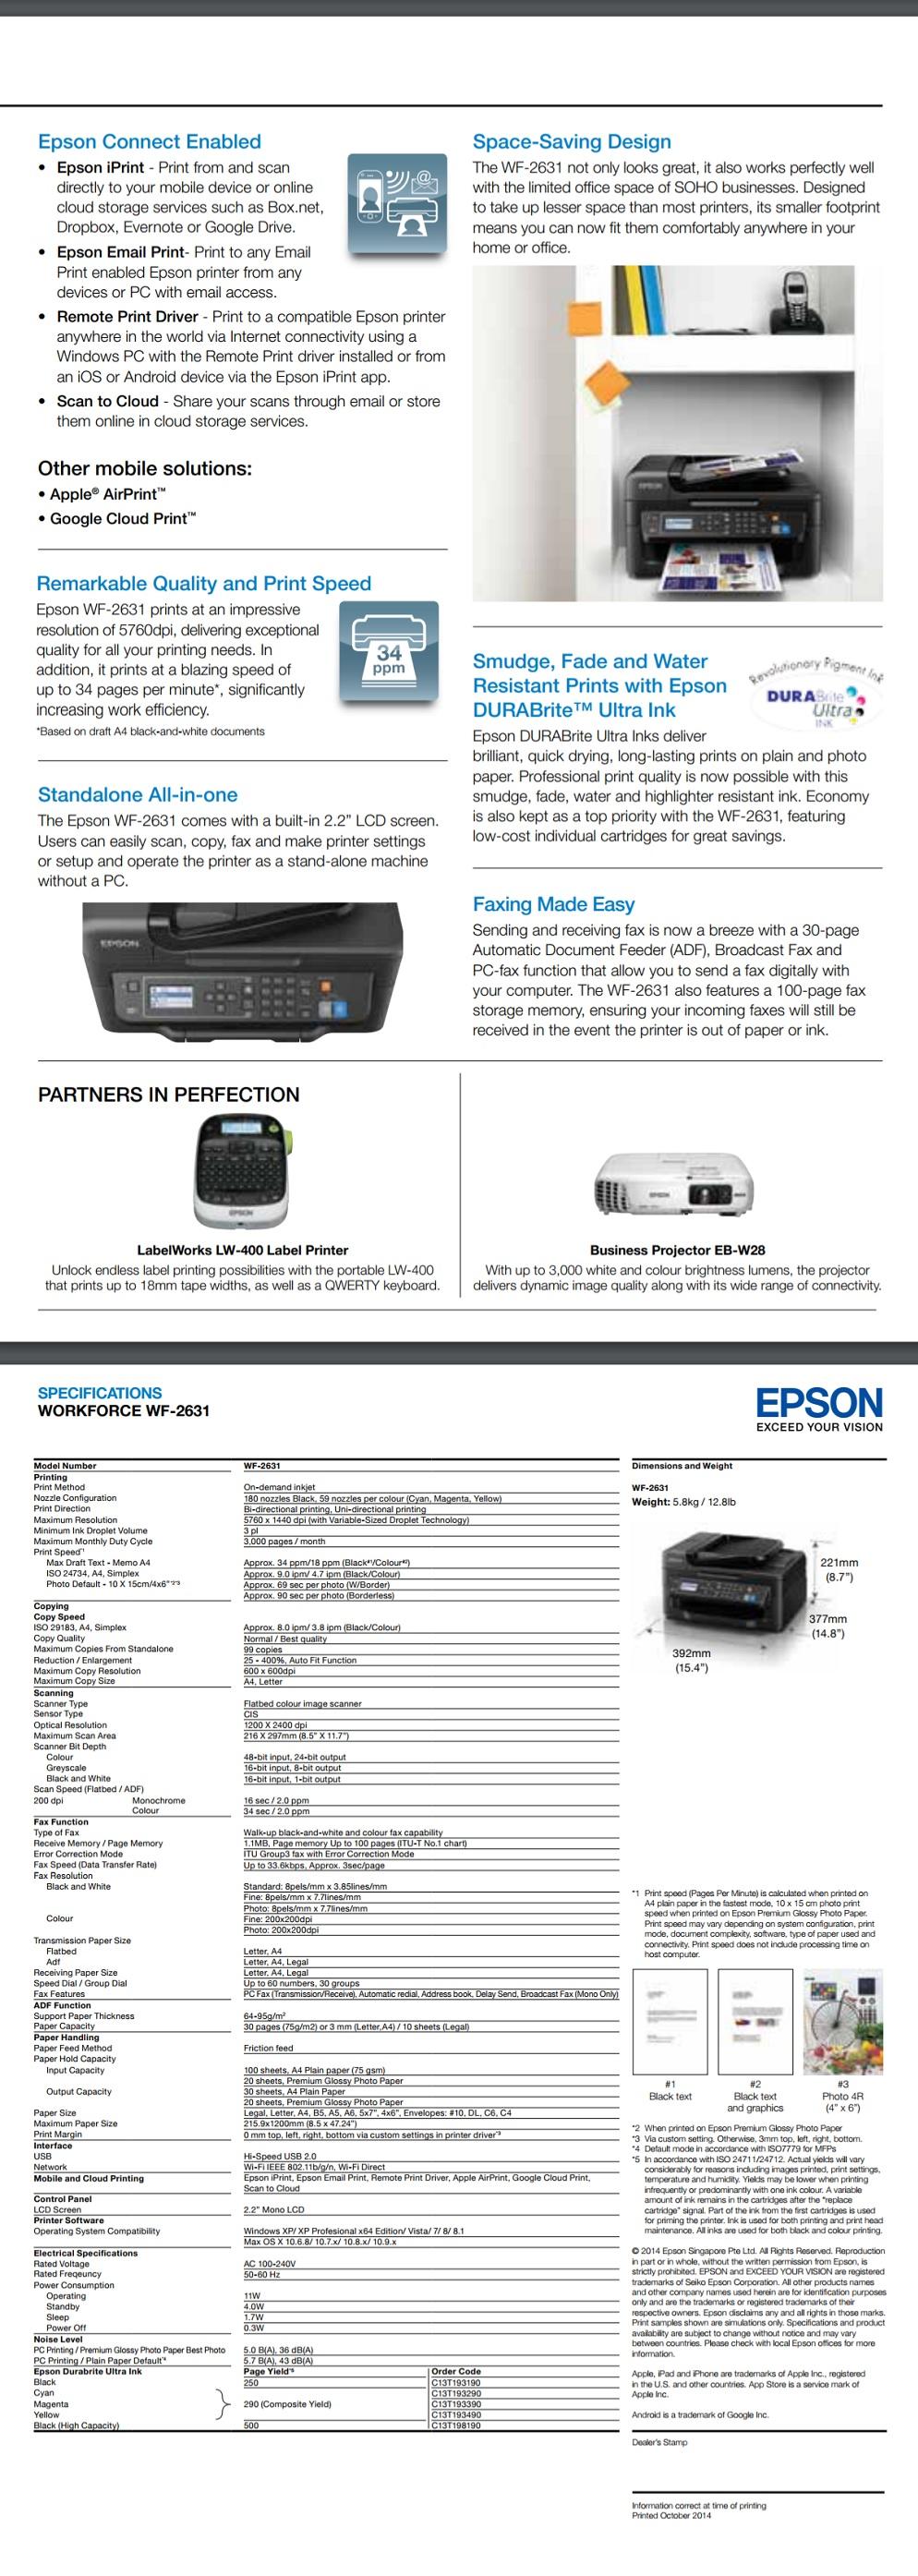 Epson WorkForce WF-2631 A4 Multi-Function Inkjet Printer for Home Office